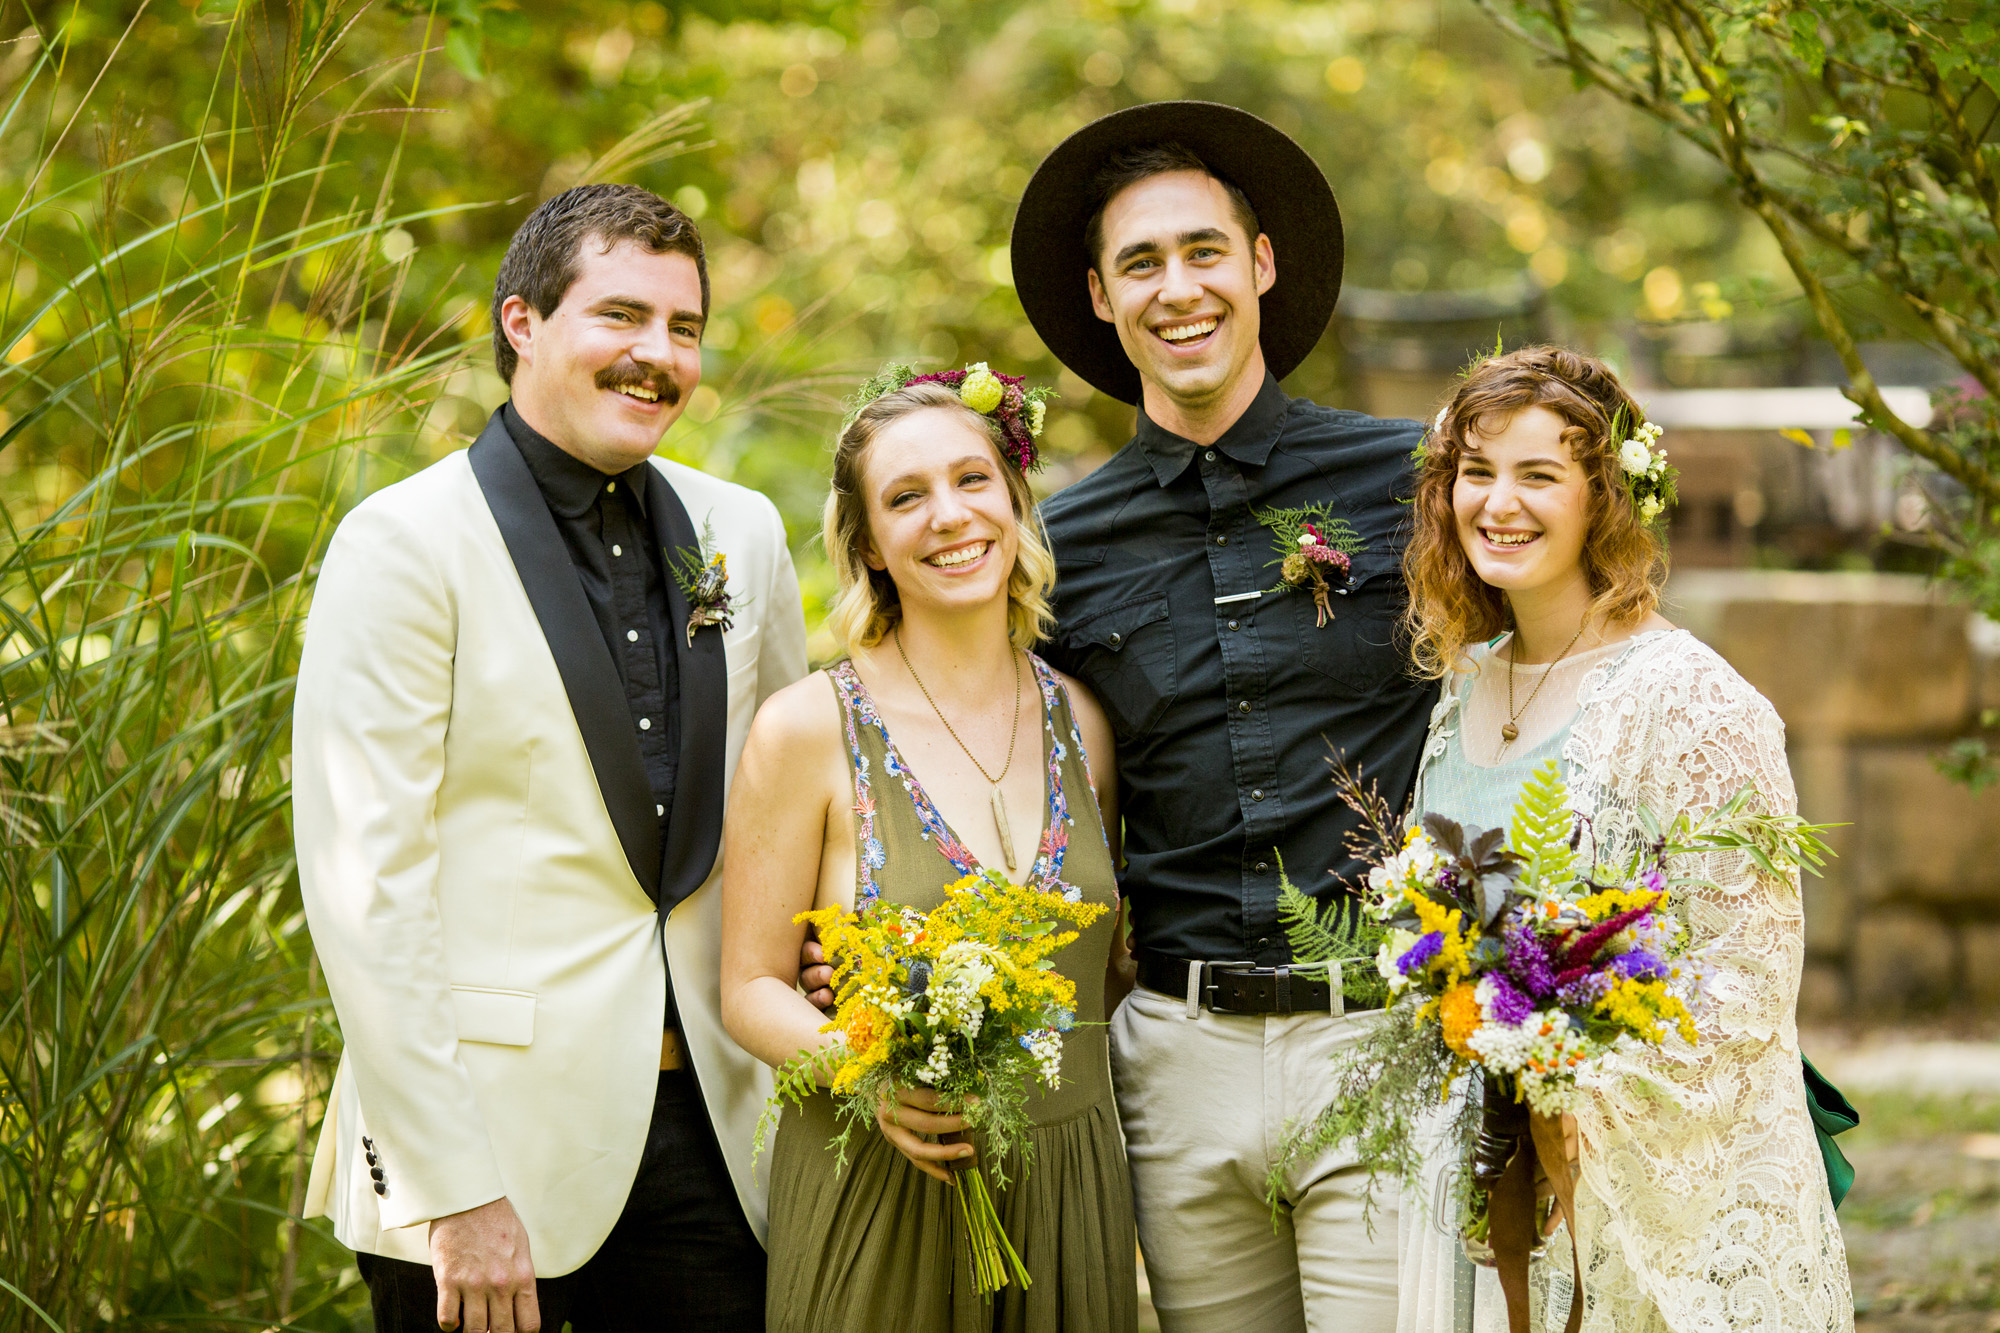 Seriously_Sabrina_Photography_Red_River_Gorge_Kentucky_Wedding_ShawnDana93.jpg